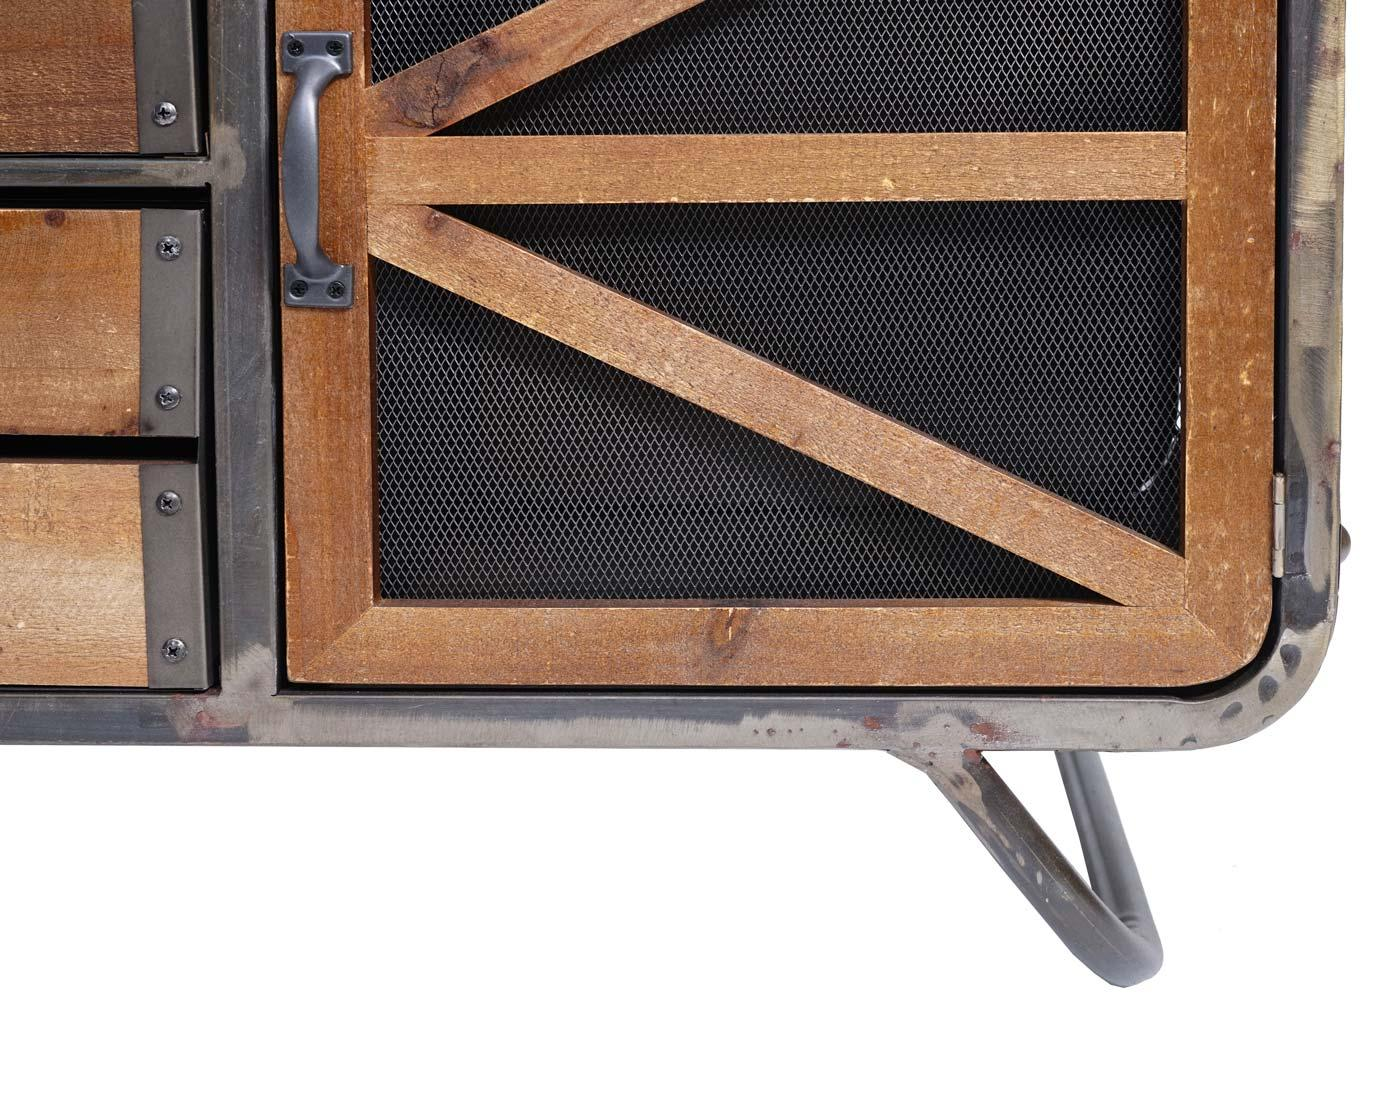 Fernsehtisch Holz Metall